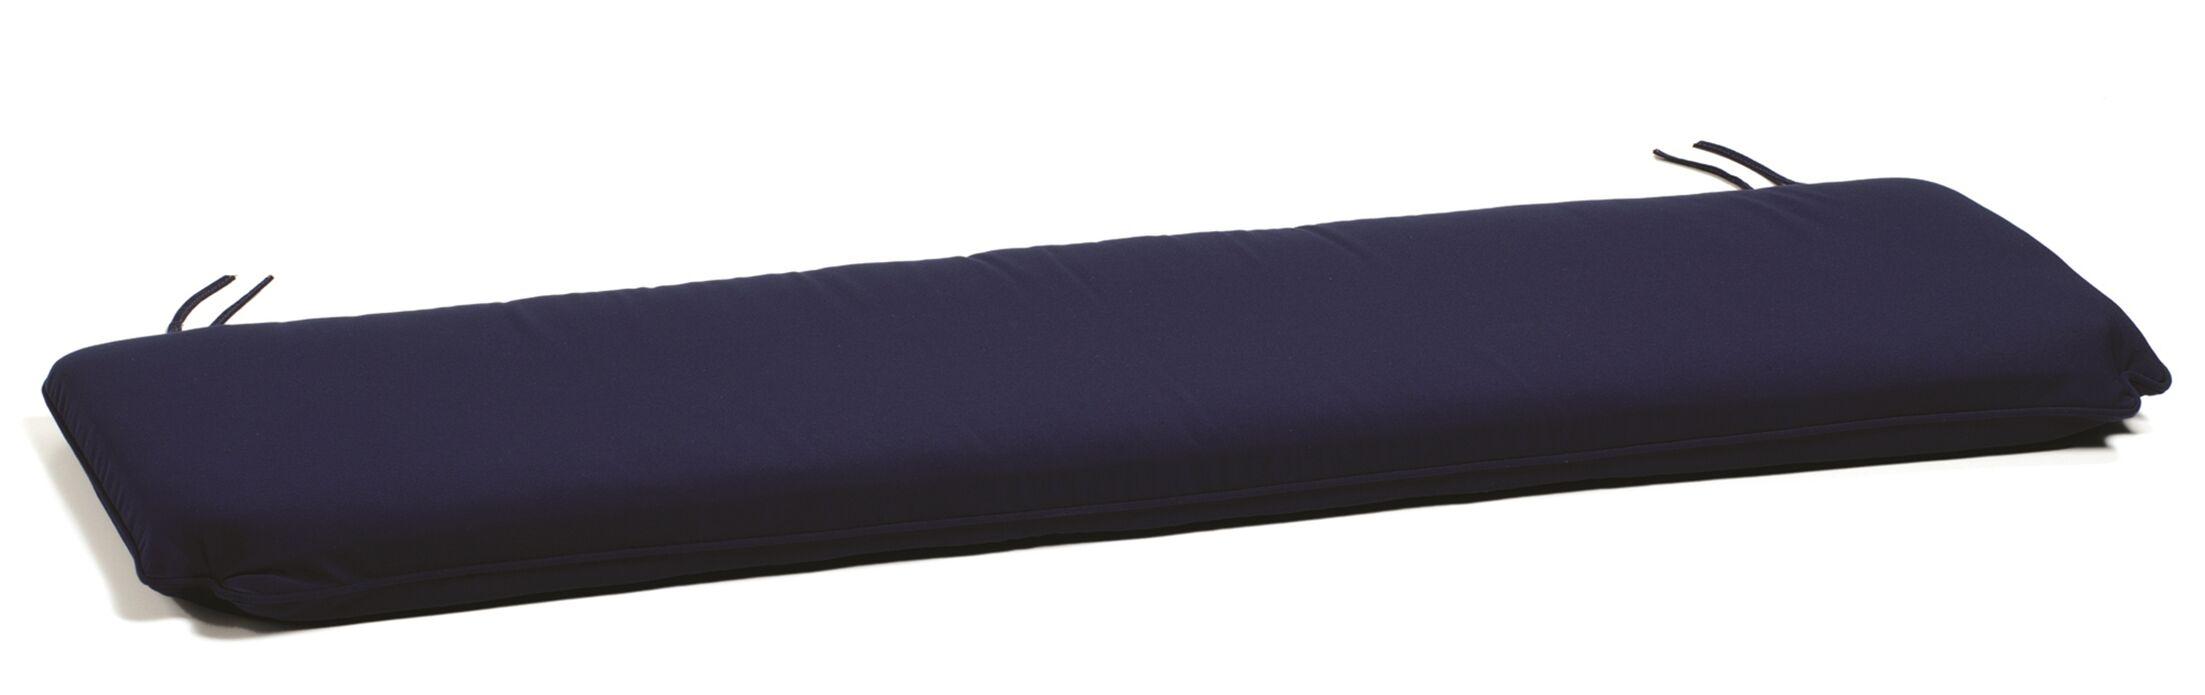 Indoor/Outdoor Bench Cushion Cushion Color: Hunter, Cushion Size: 48